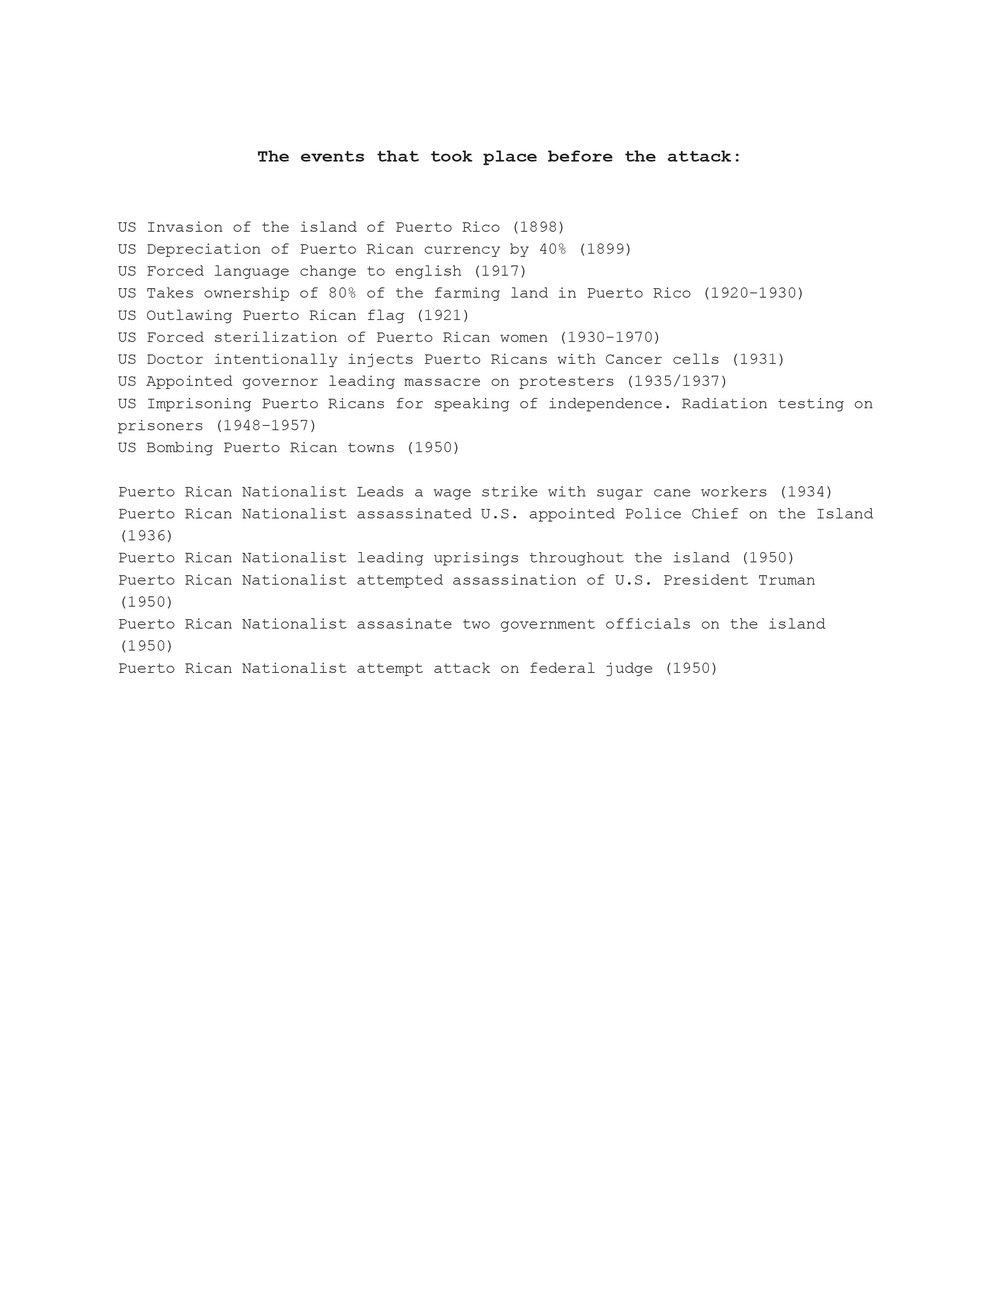 Untitleddocument (2)-2.jpg